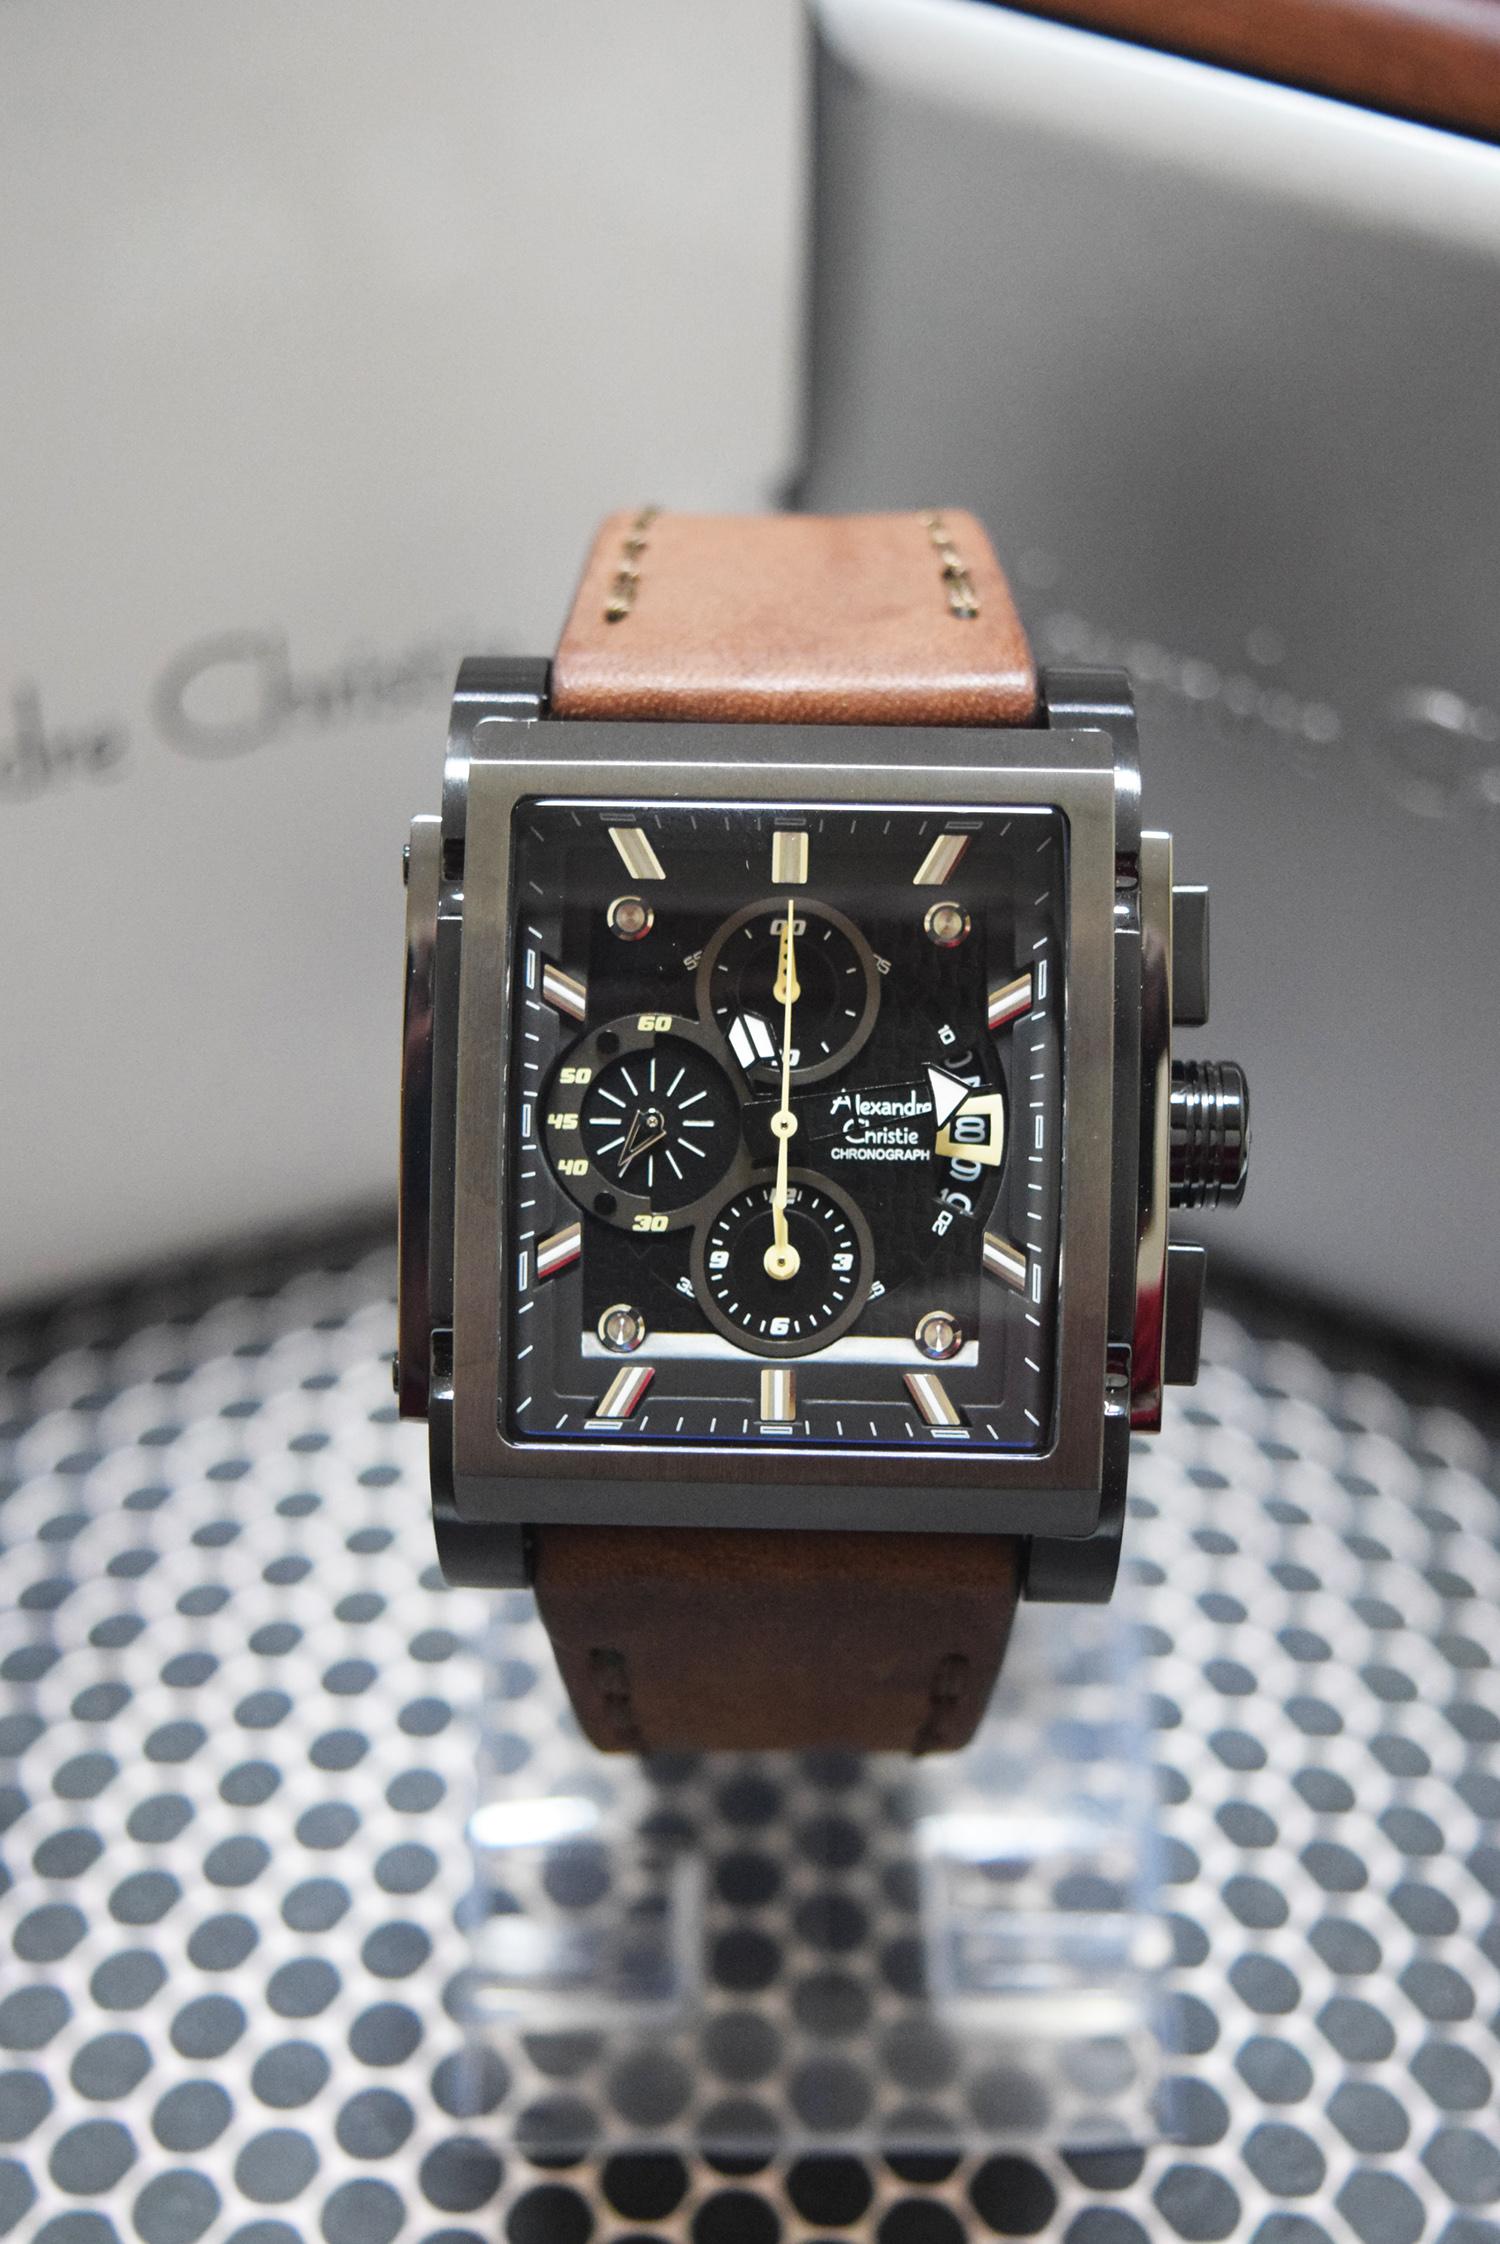 Jual Alexandre Christie Ac 6405 Full Black Leather Brown Men Alexandra Watch Original Anita Watches Tokopedia